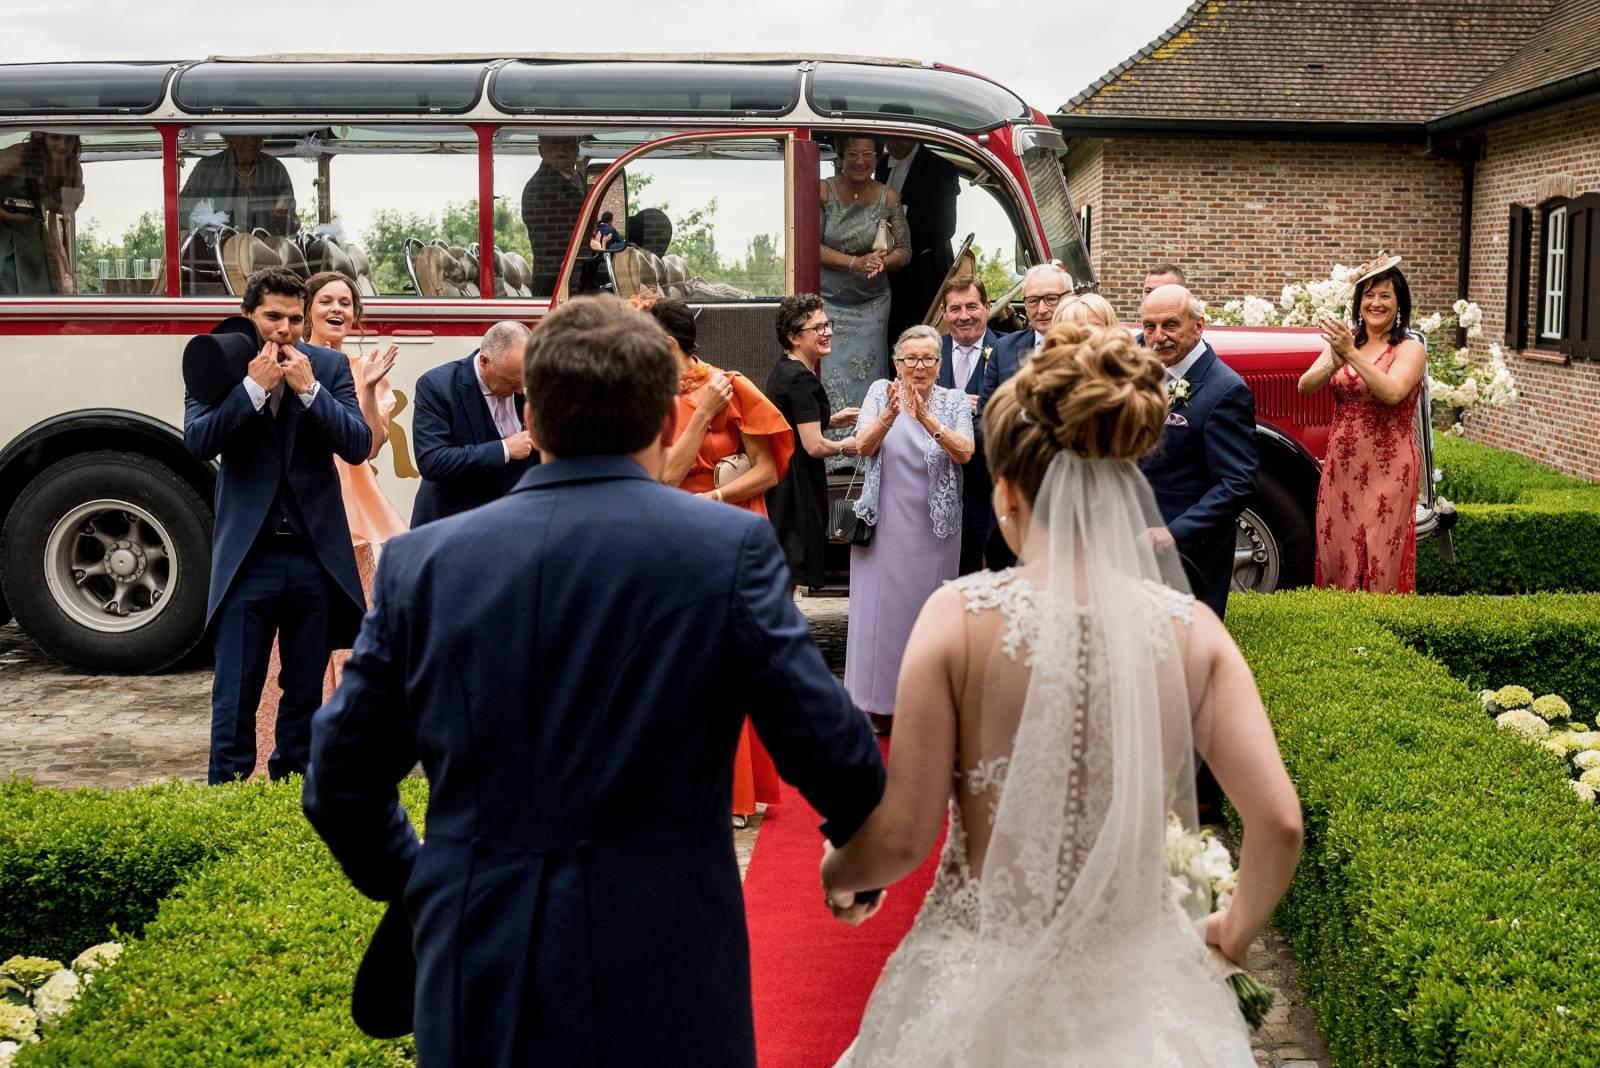 Fotografie Melody - Huwelijksfotograaf - Trouwfotograaf - House of Weddings - 3